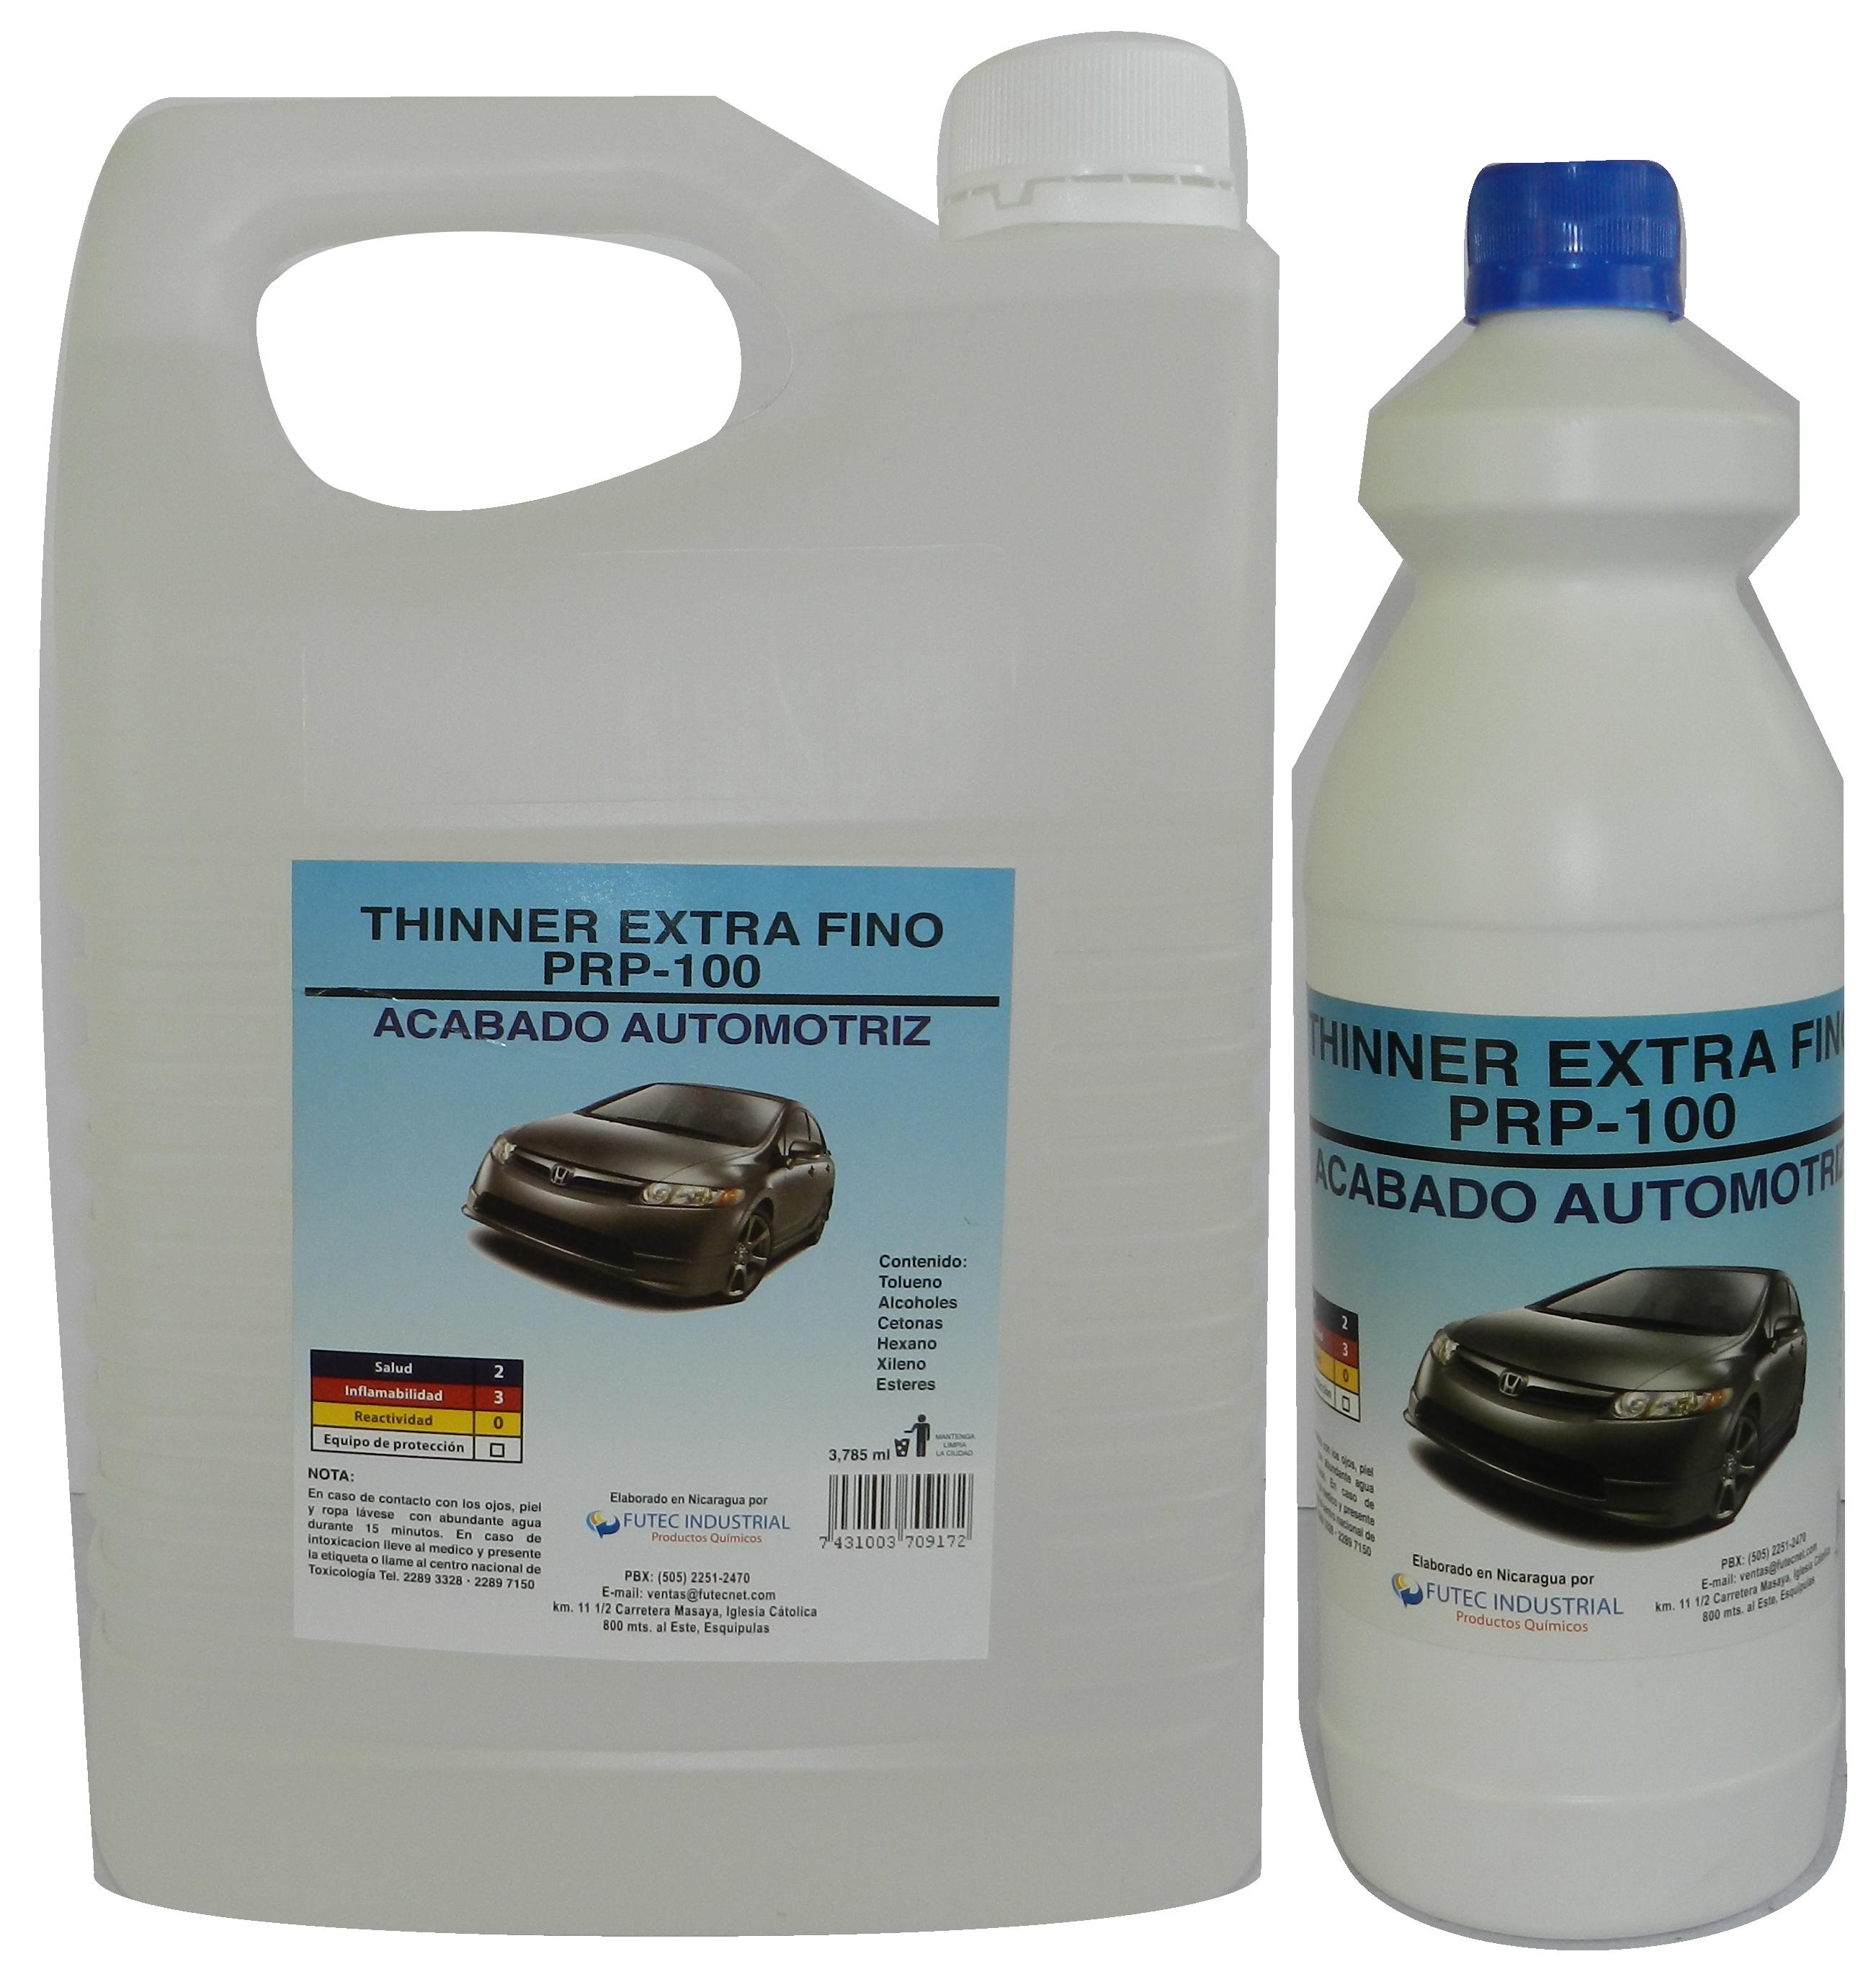 Thinner Extrafino